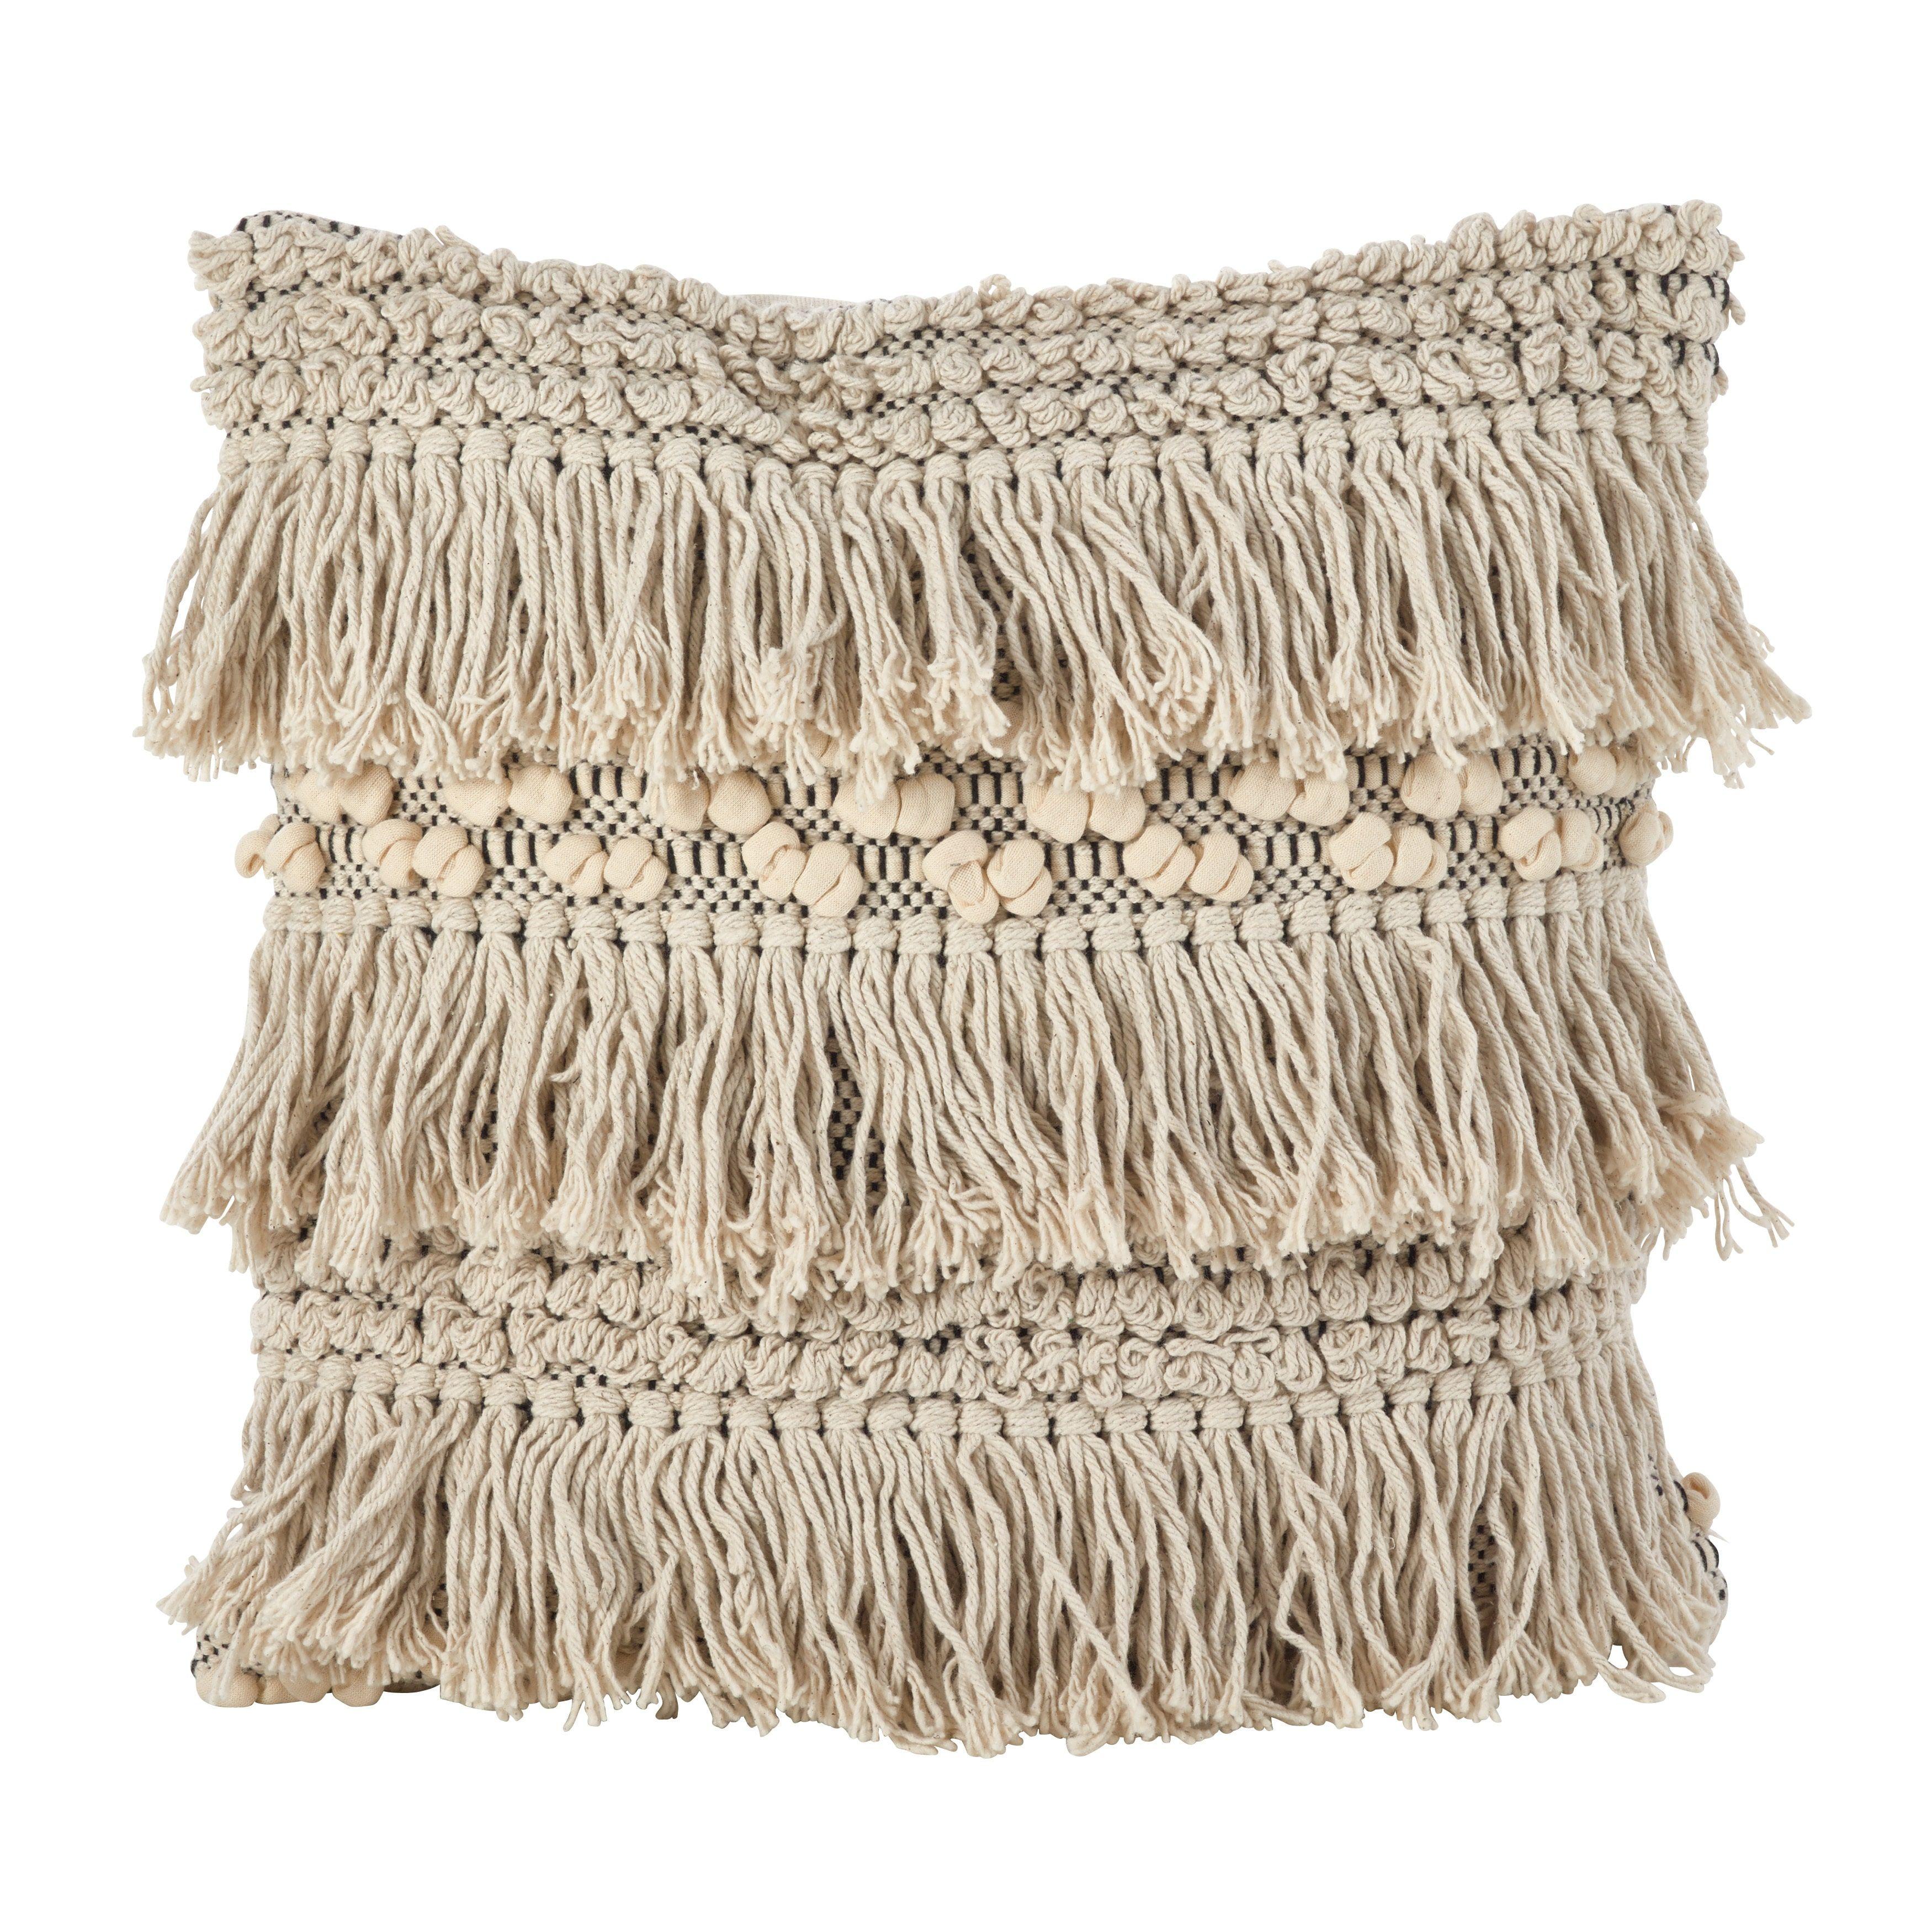 Saro Moroccan Wedding Blanket Style Fringe Cotton Down Filled Throw